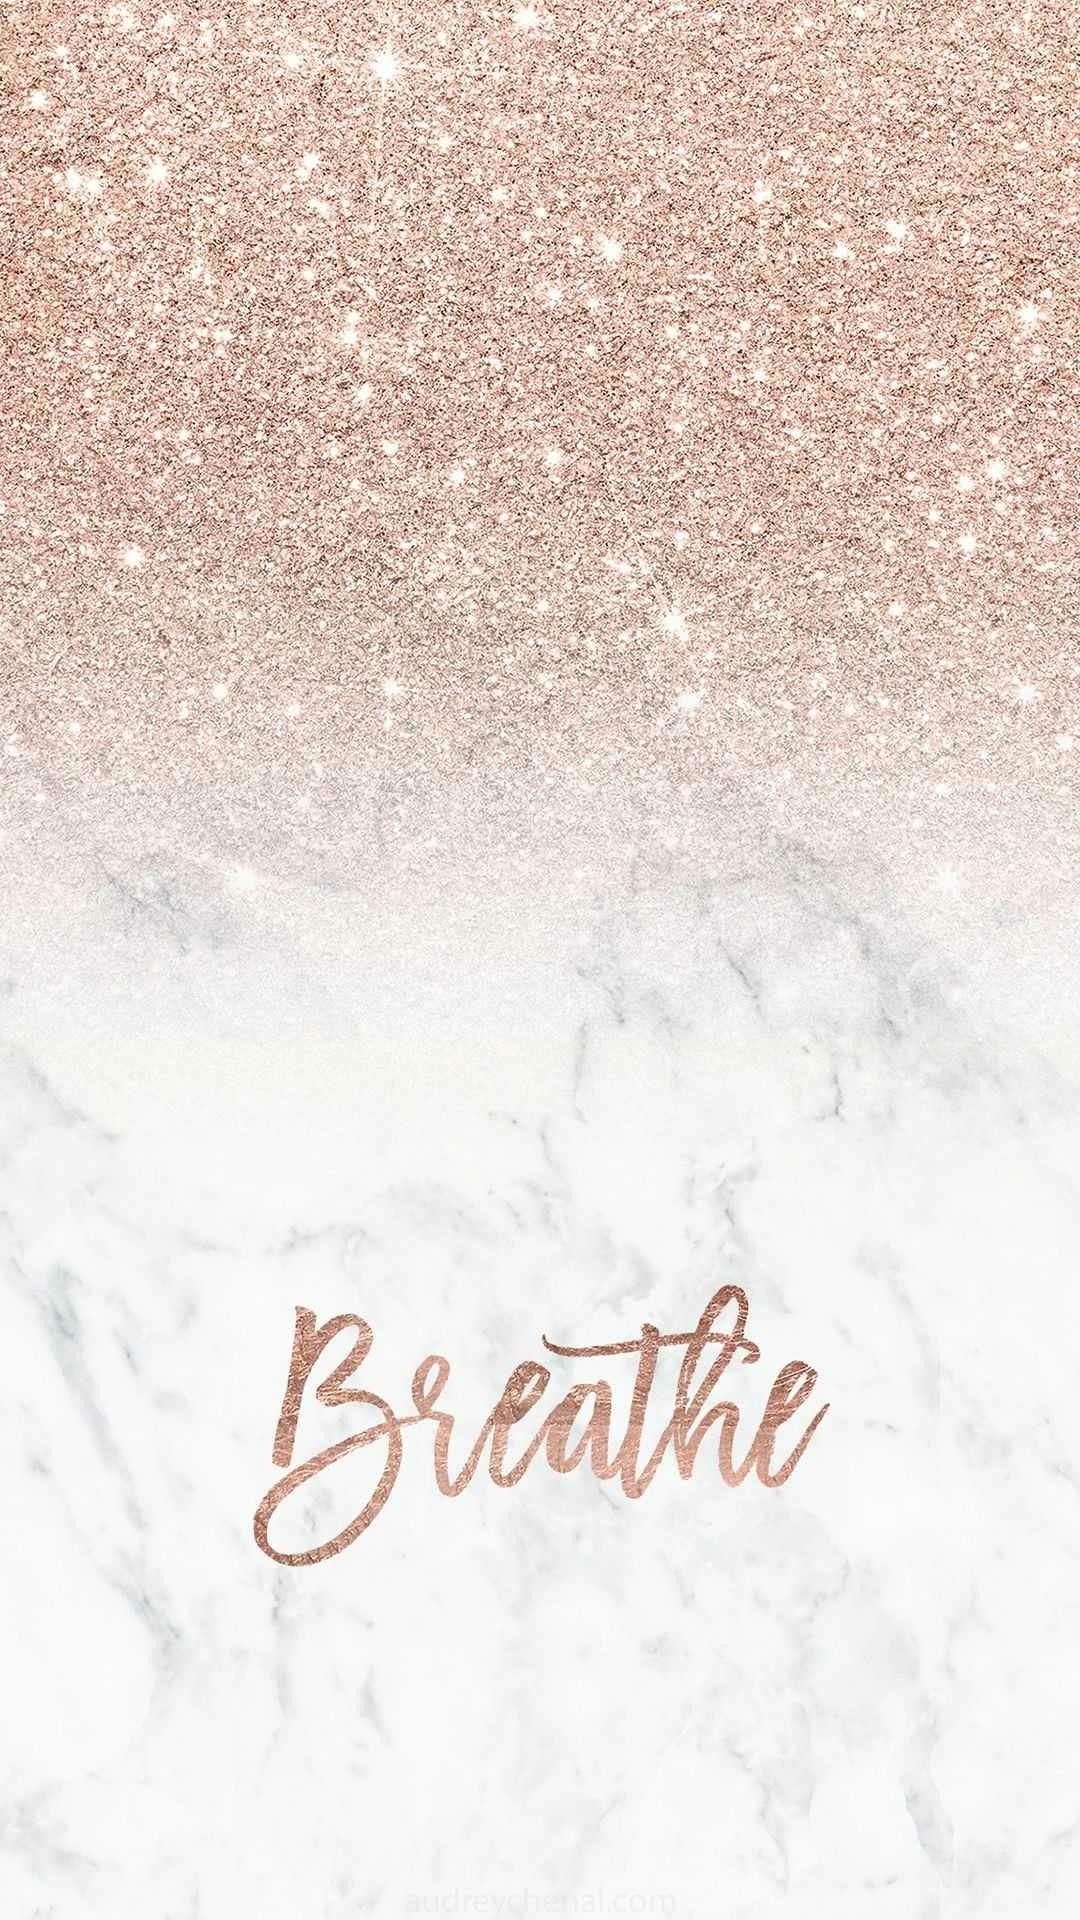 Rose Gold Aesthetic Wallpaper Iphone - HD Wallpaper